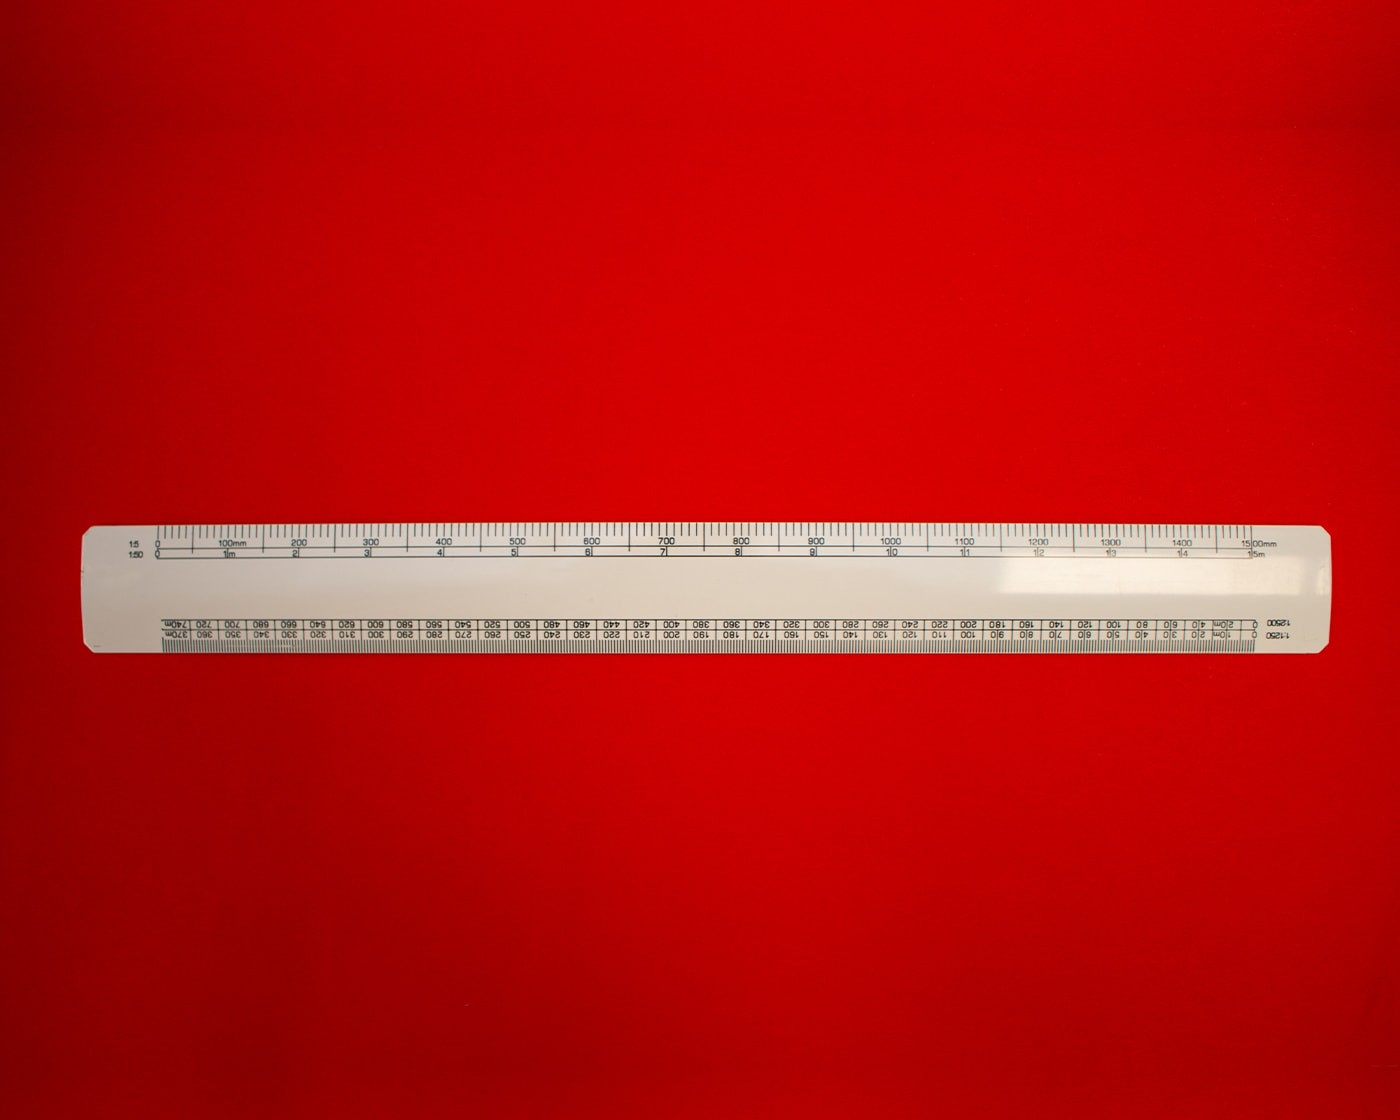 Branded-Scale-Ruler